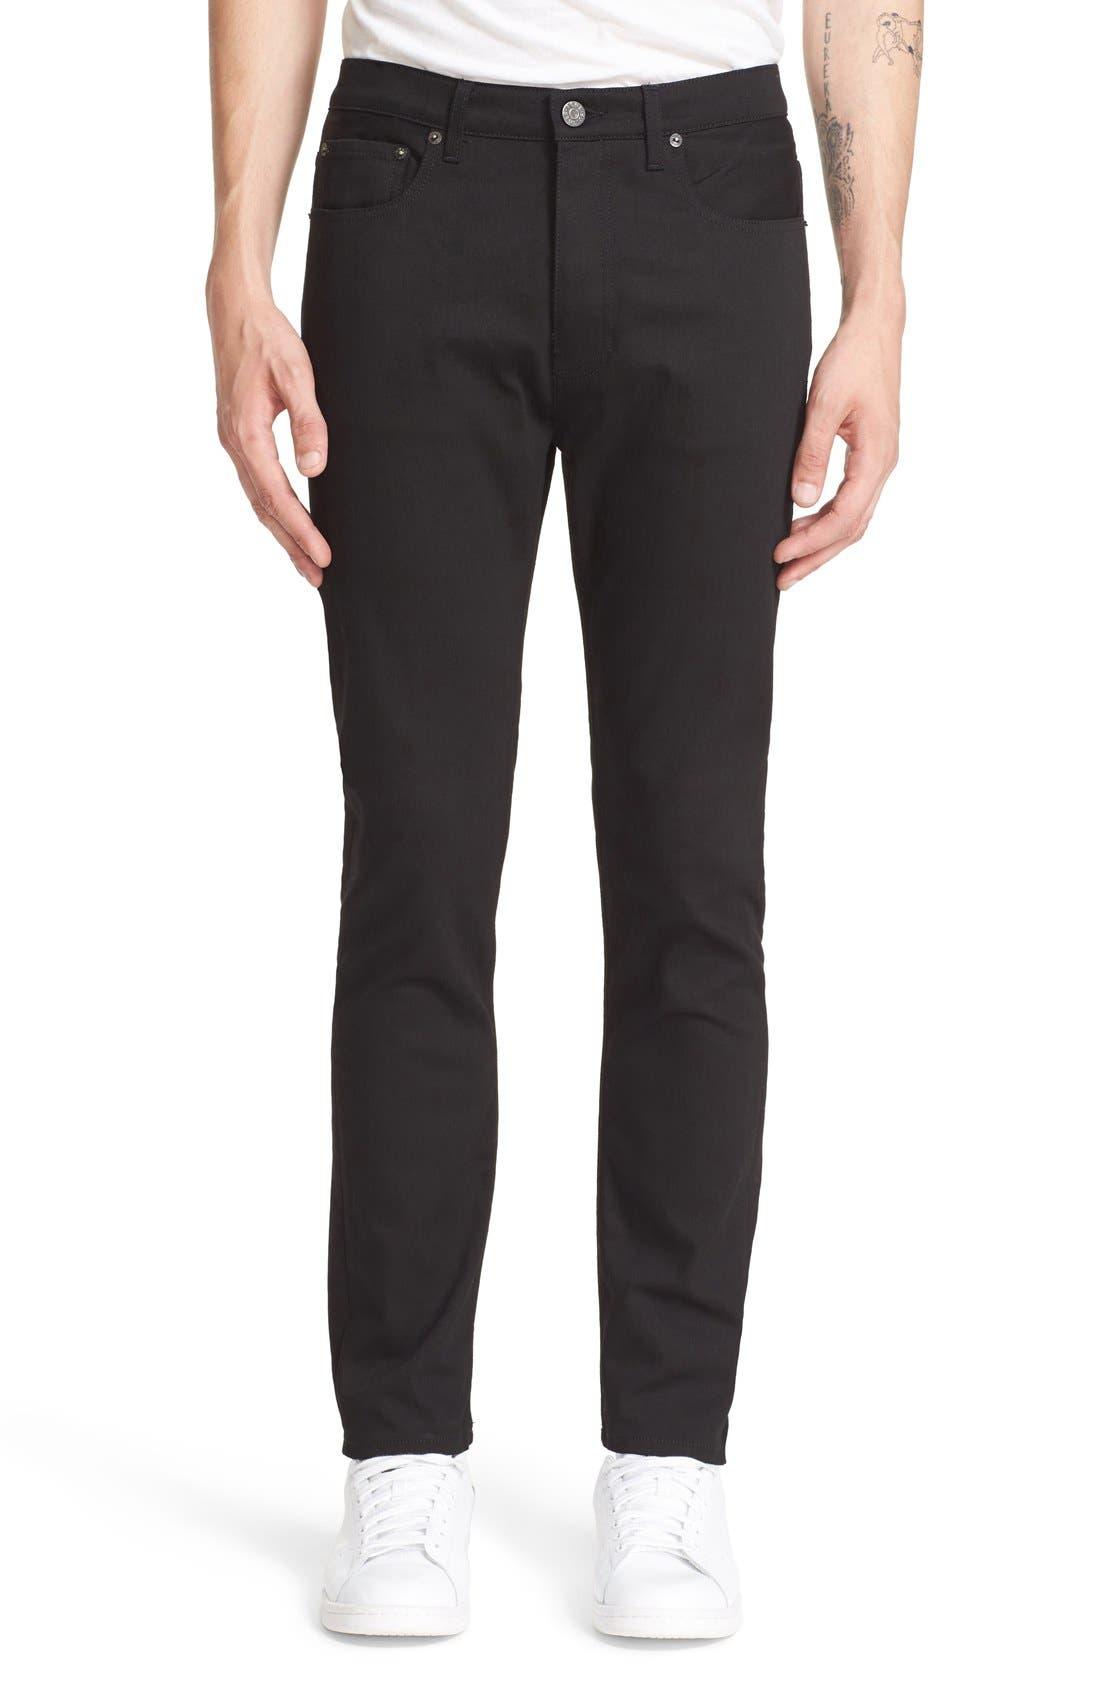 ACNE STUDIOS Town Straight Leg Jeans, Main, color, 001